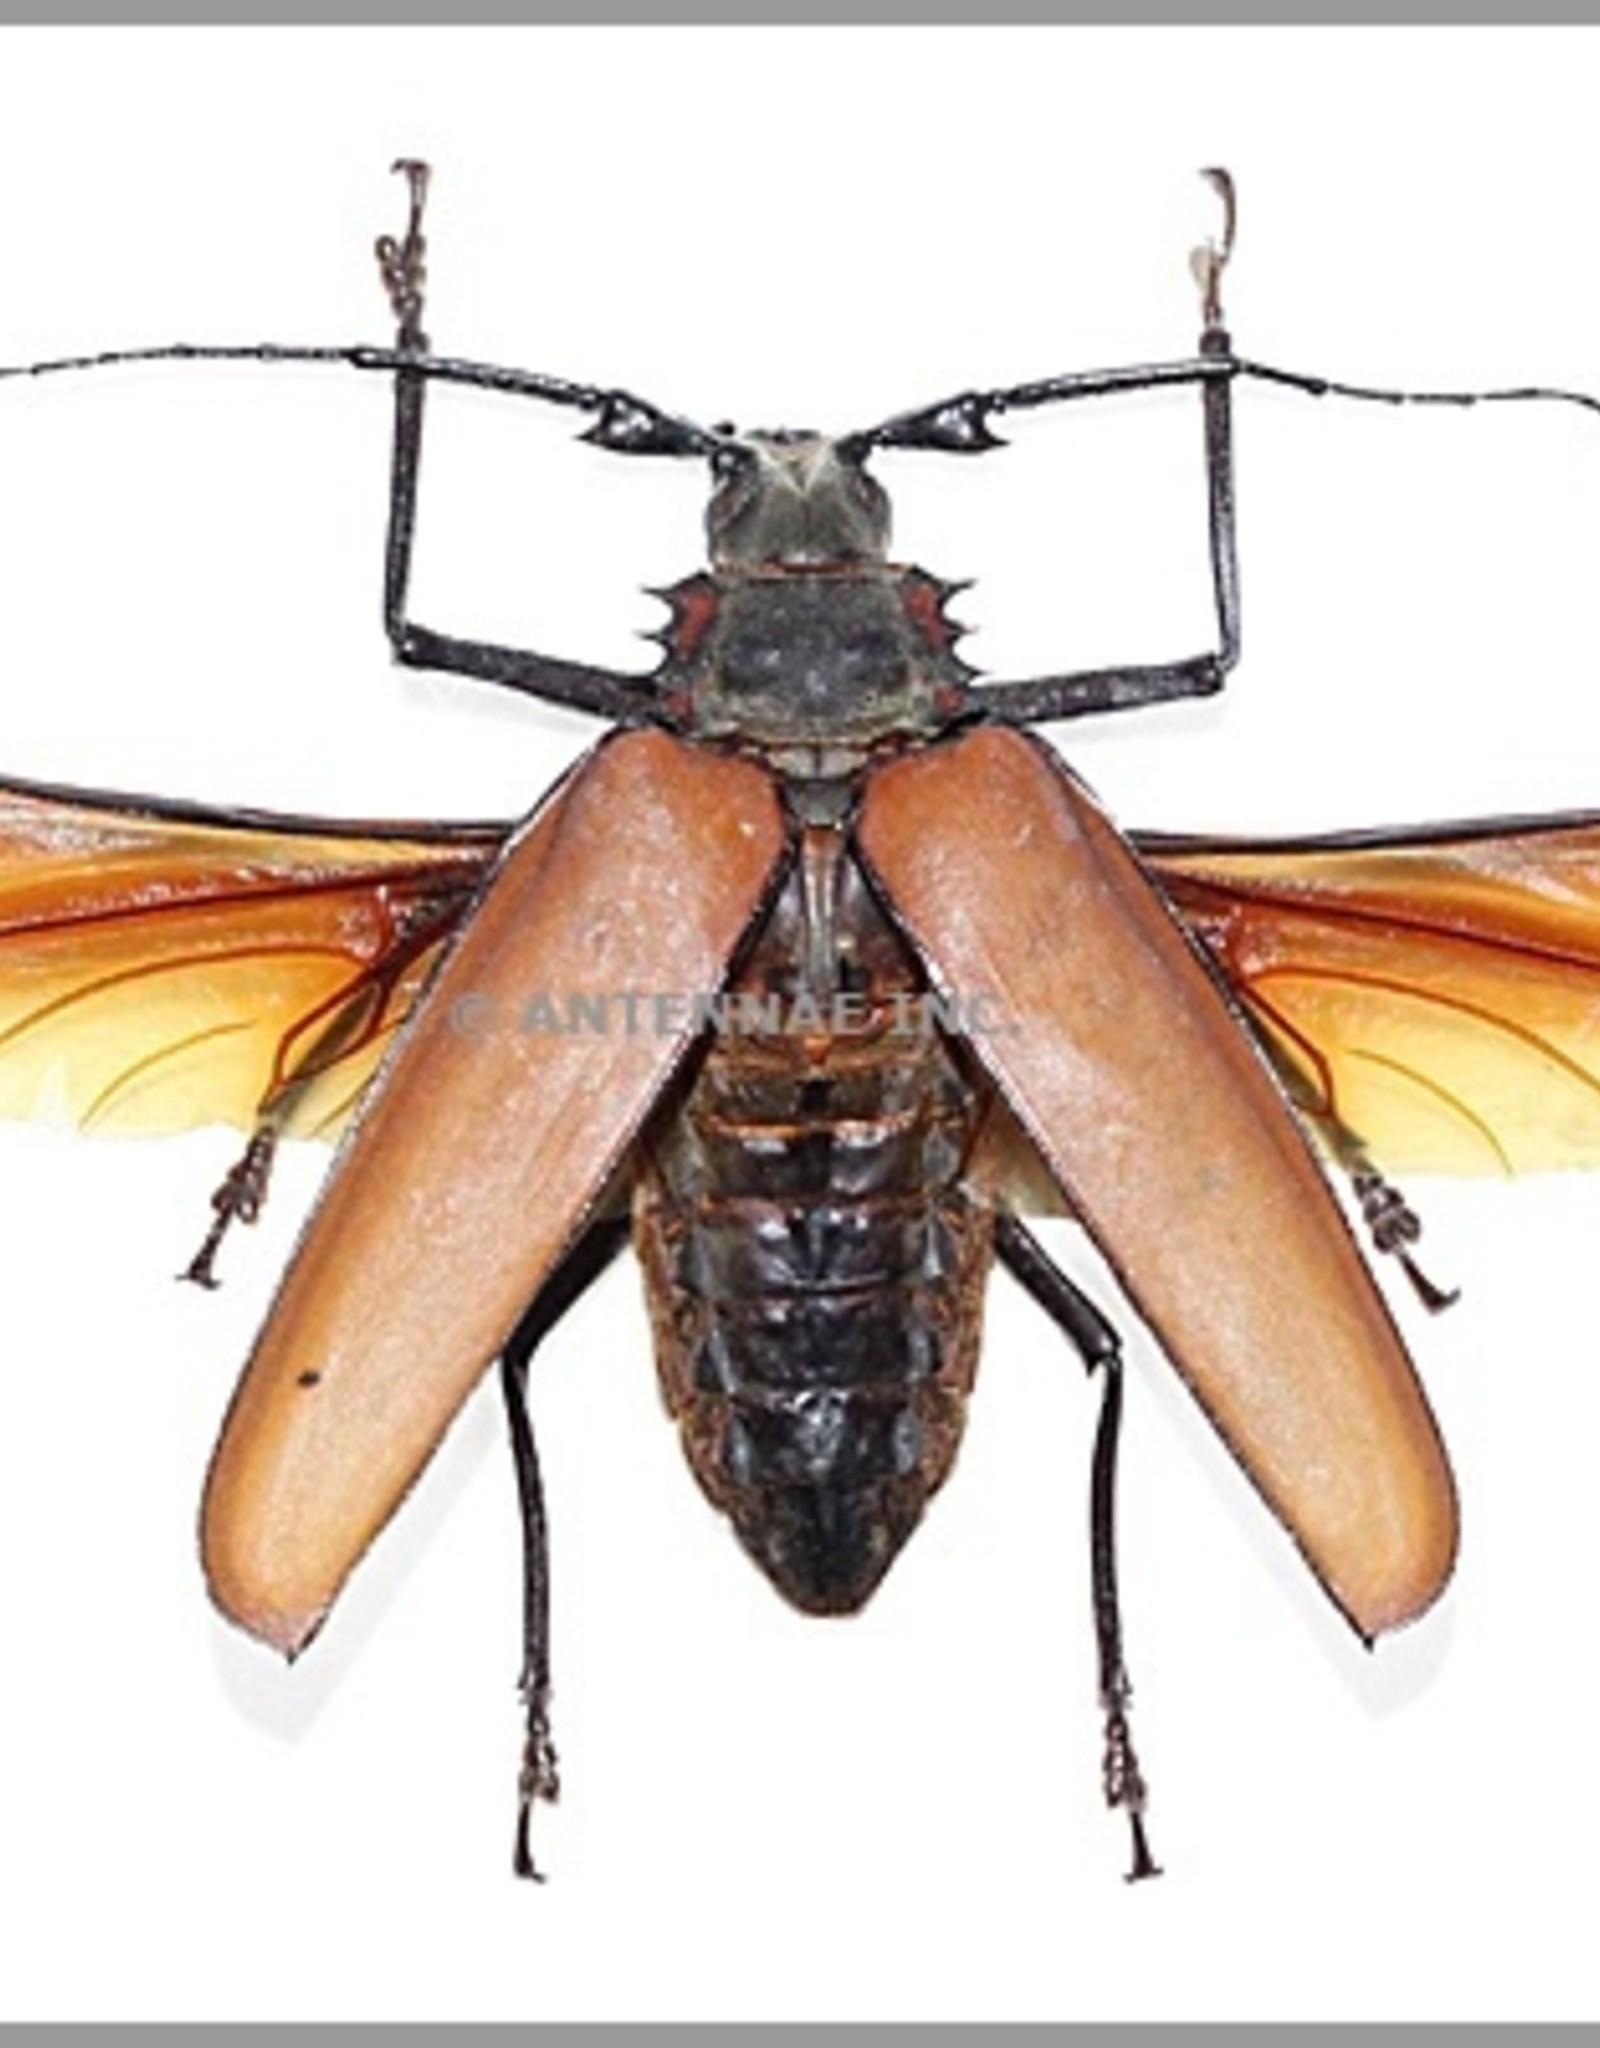 Callipogon (Enoplucerus) armillatus PAIR A1 Peru 8.6-9.0 cm